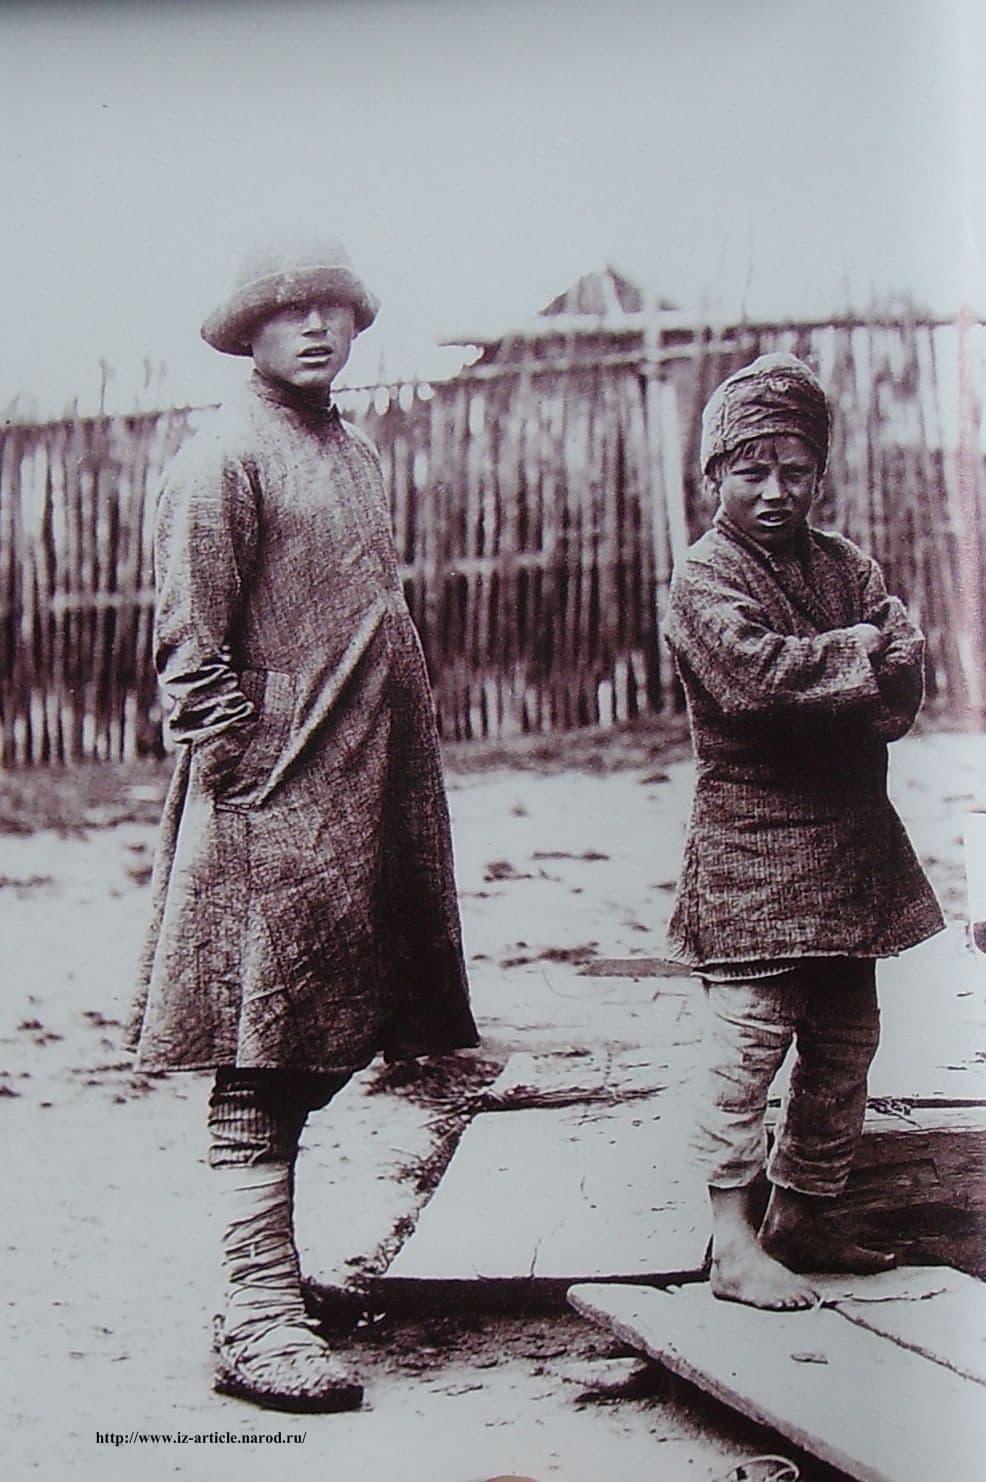 Фото Удмуртов снимок 1911 г.